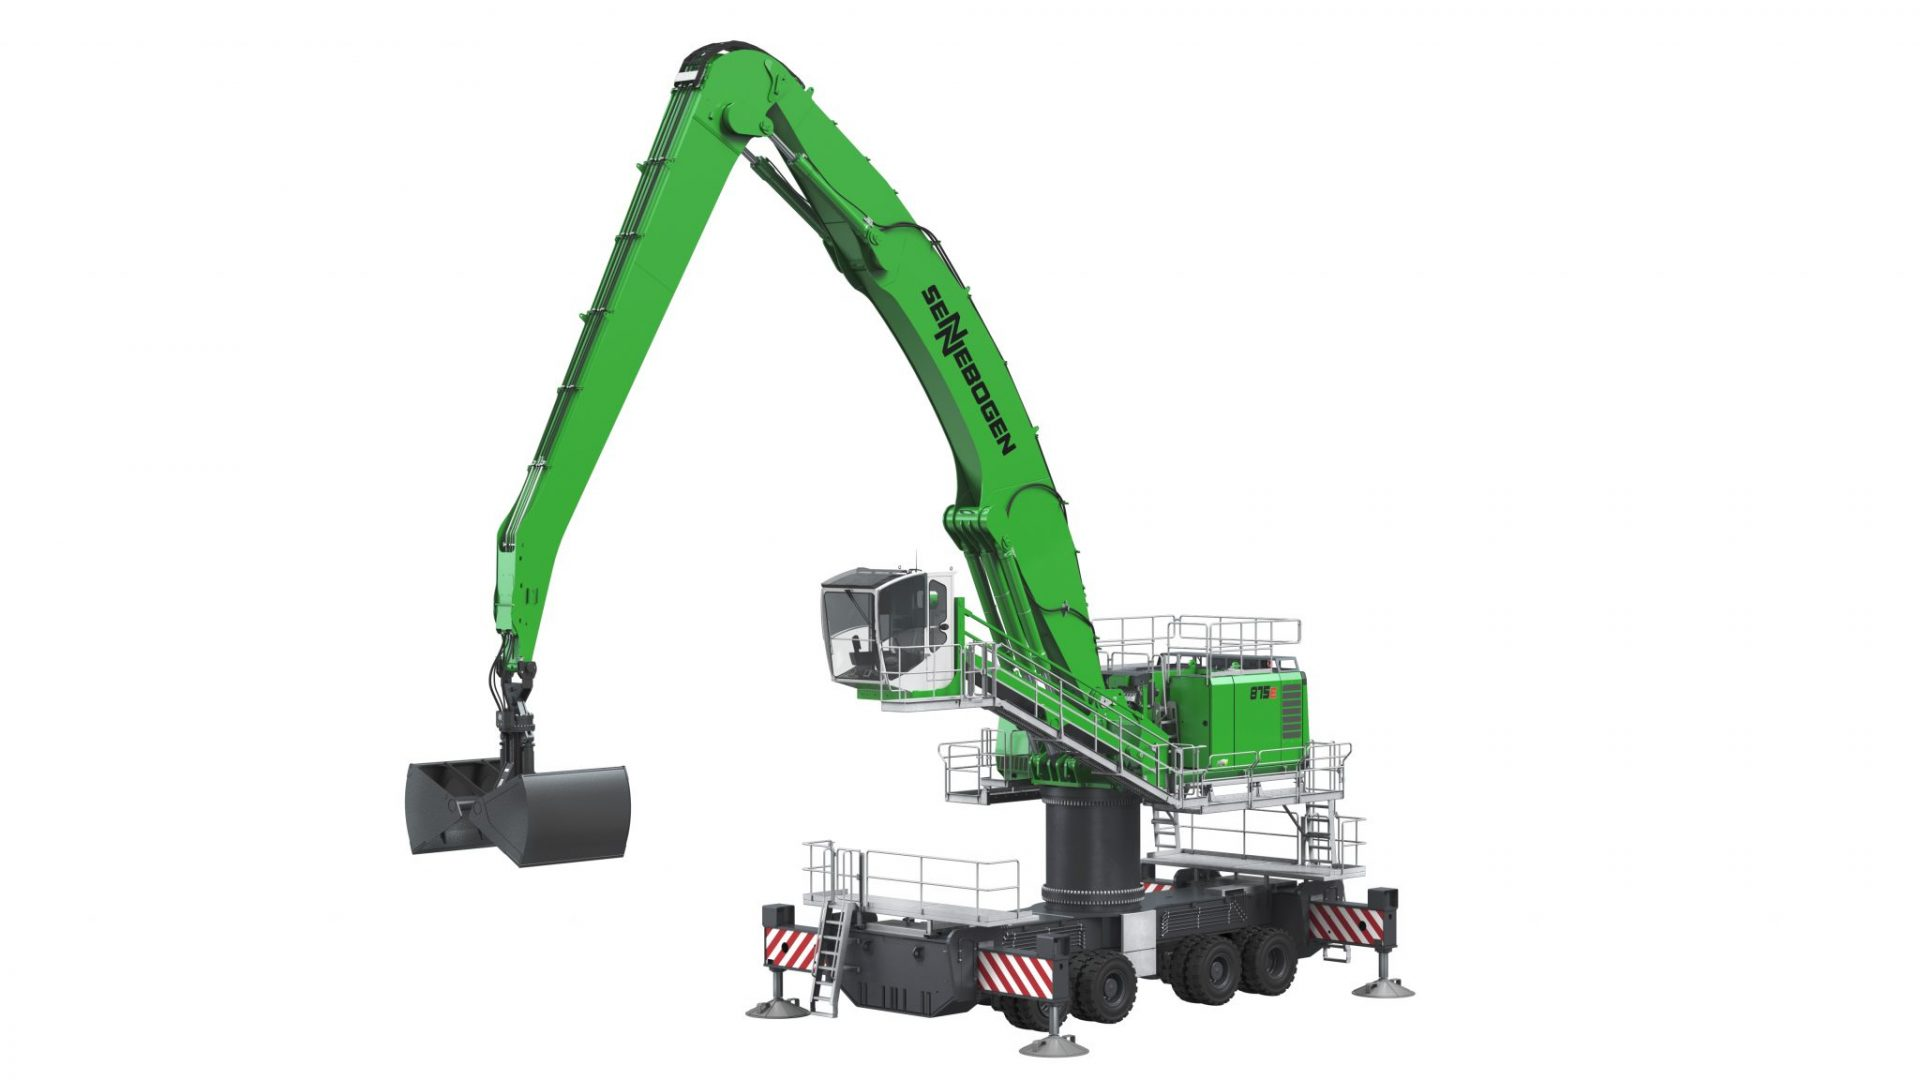 Sennebogen Material Handling 875 E - SMT